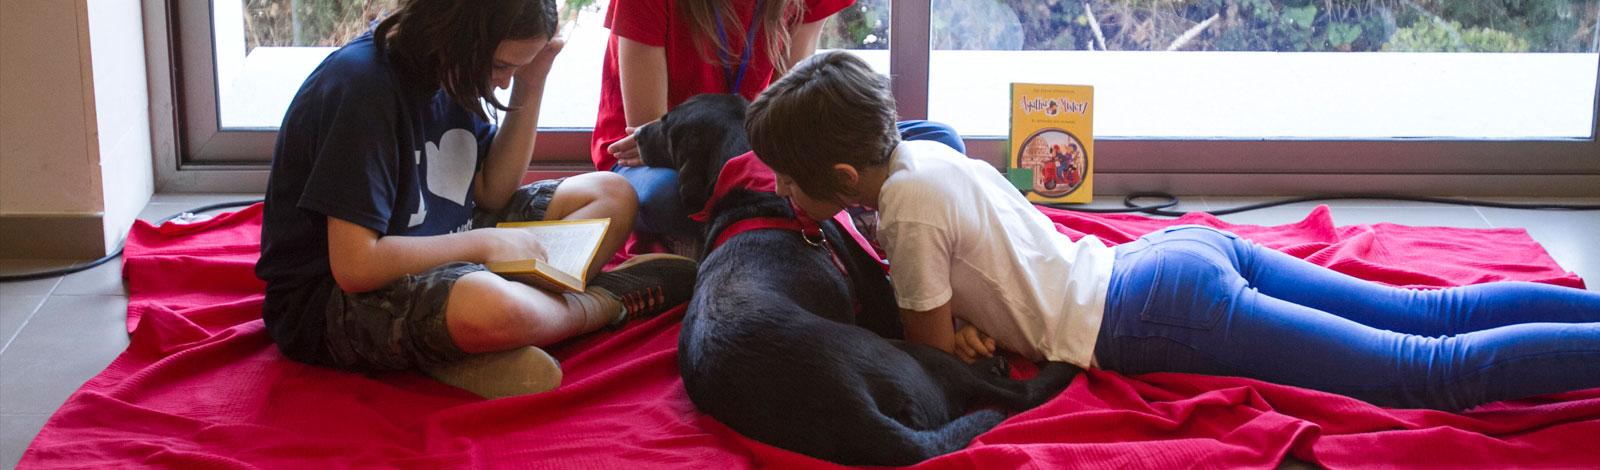 Terapia_asistida_con_animales_0058_humanymal